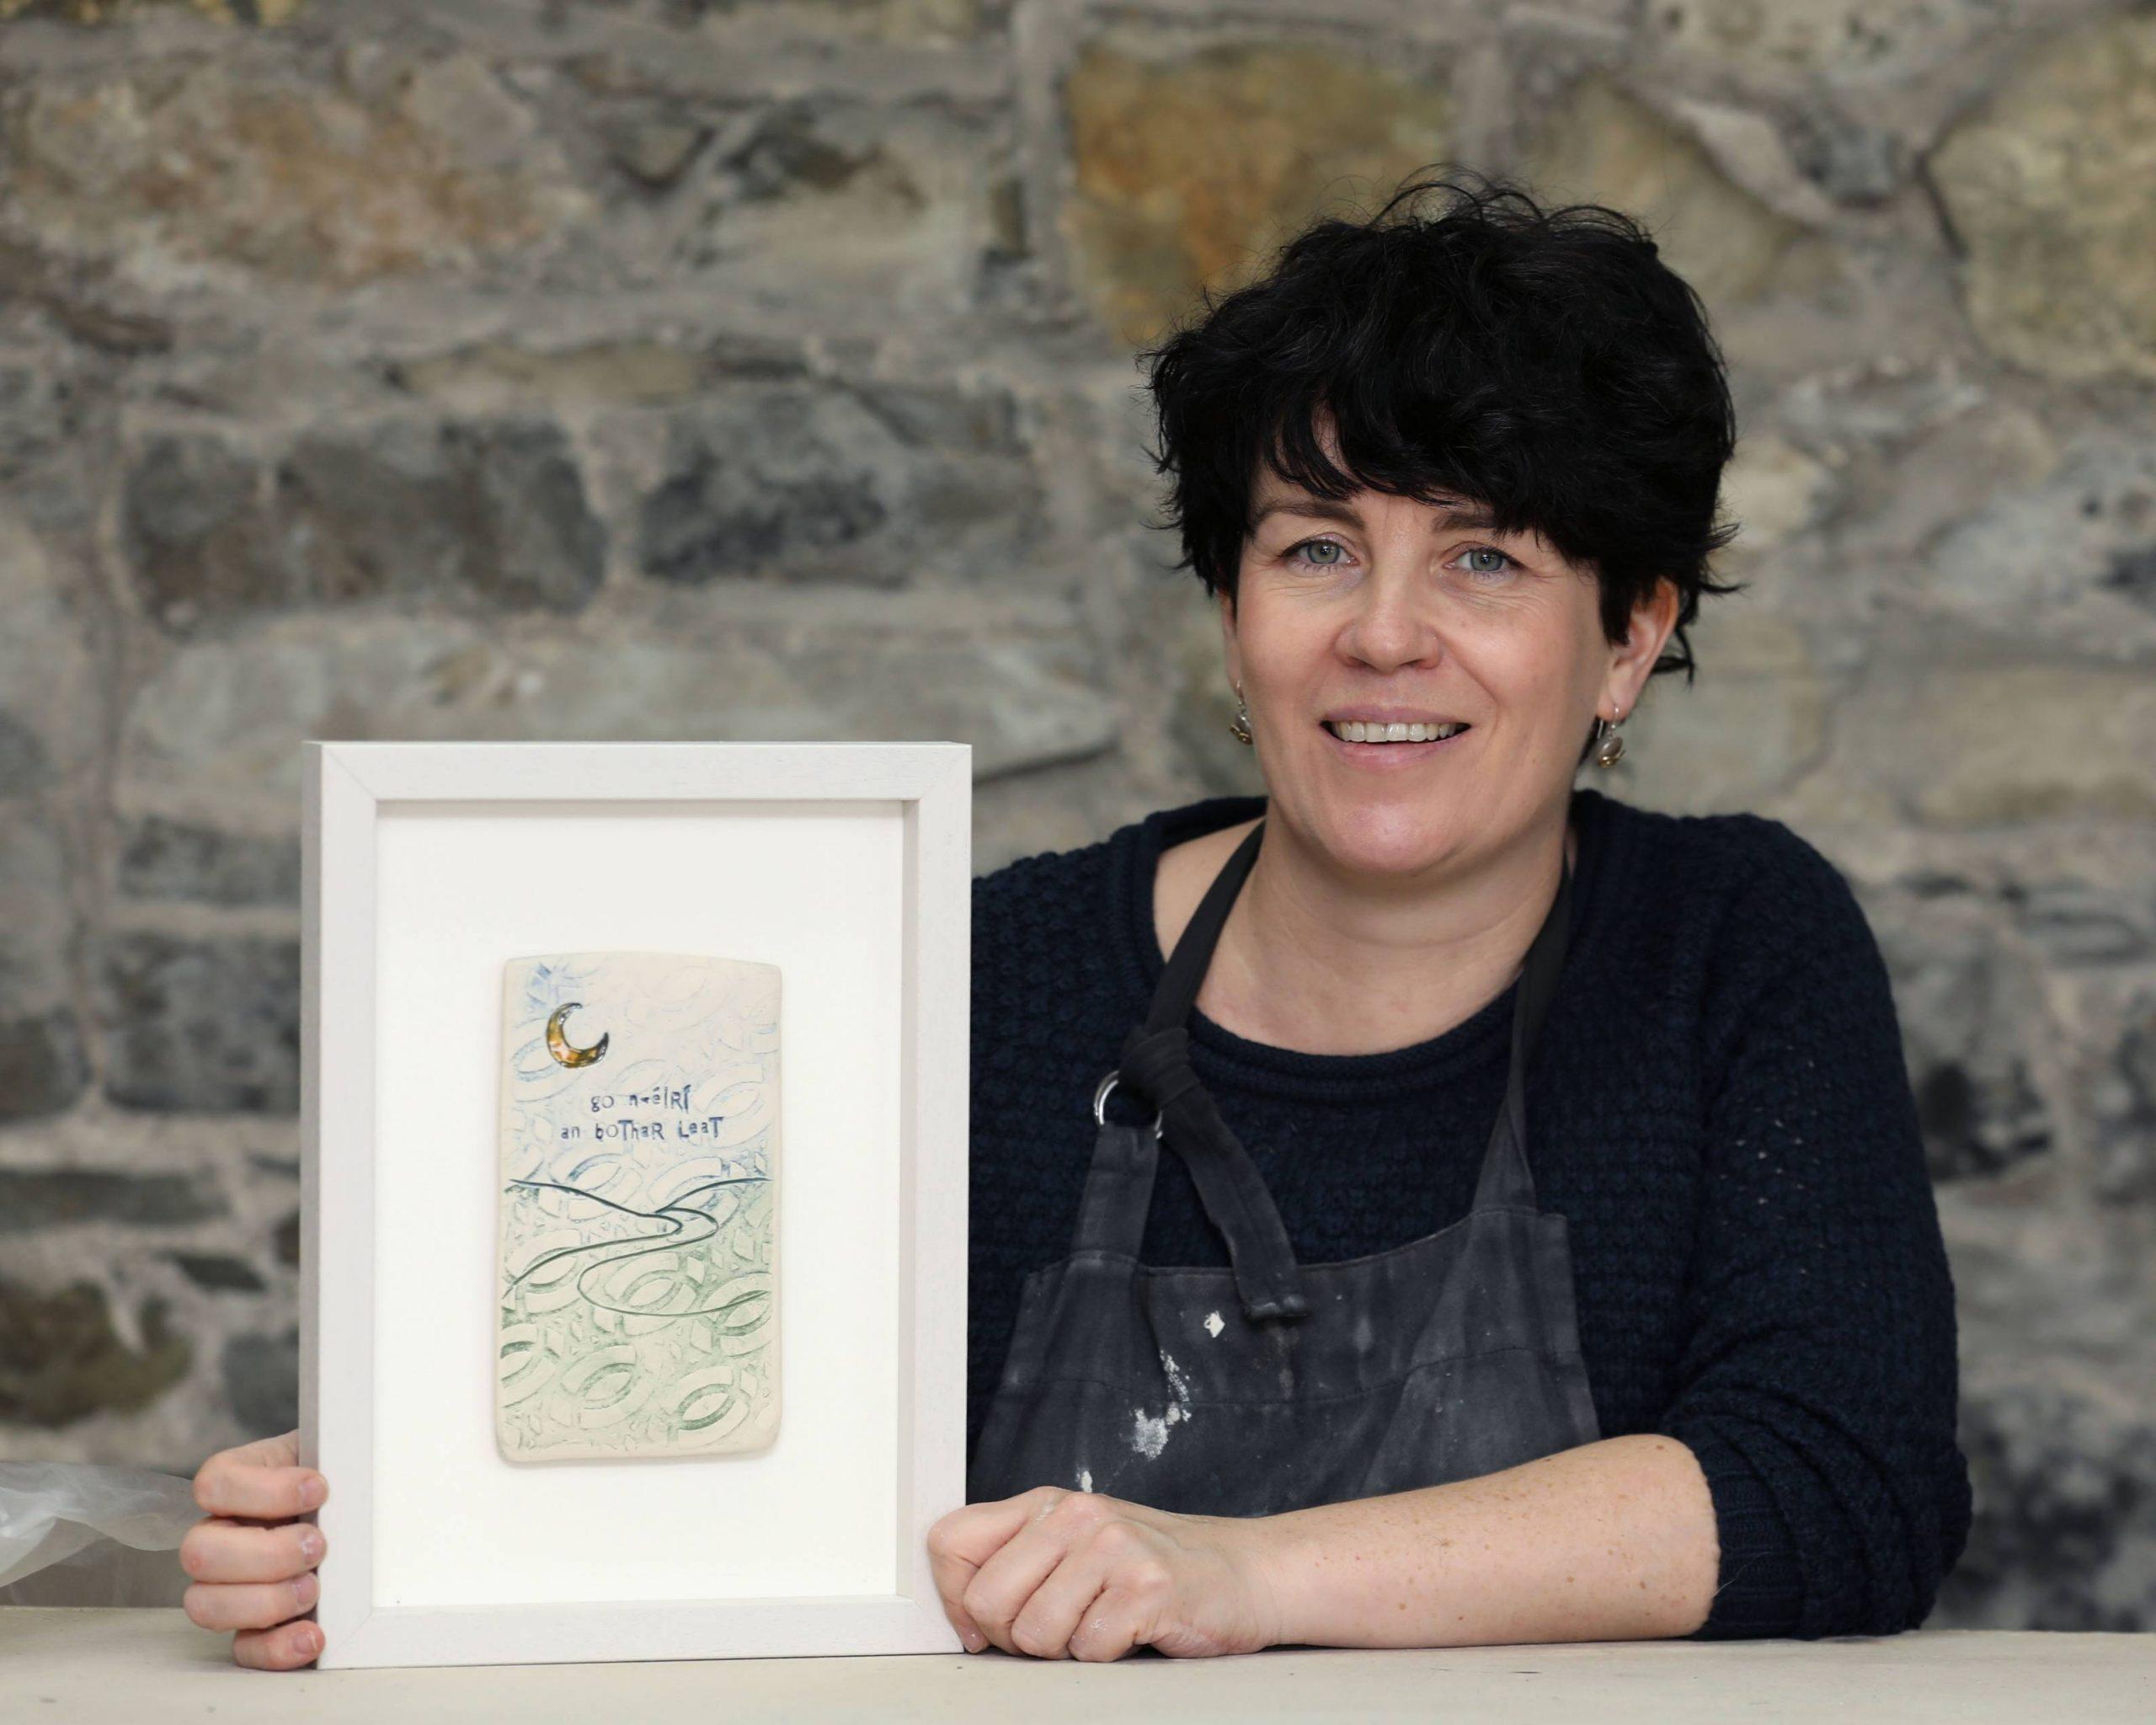 WOMEN OF THE IRISH FOOD INDUSTRY – SARAH MCKENNA, CERAMICS ARTIST